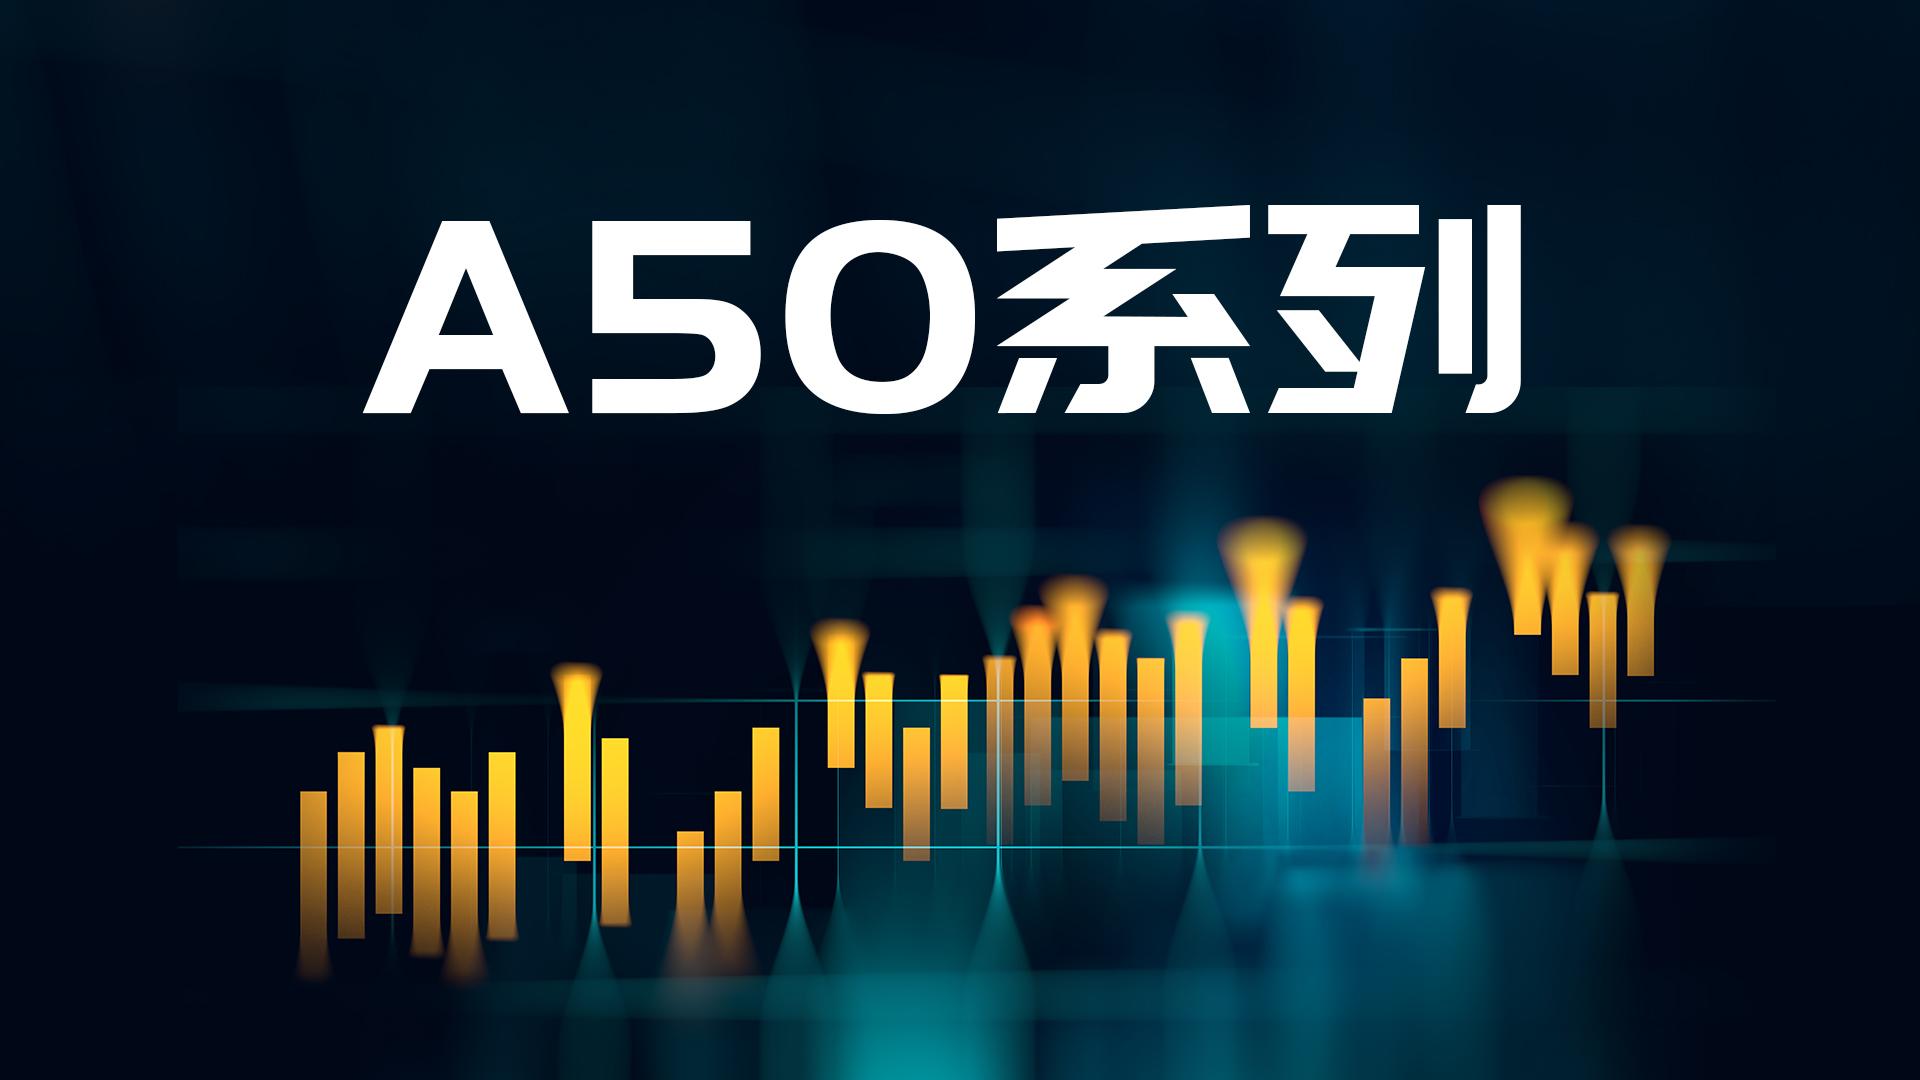 A50系列(1)(3).jpg